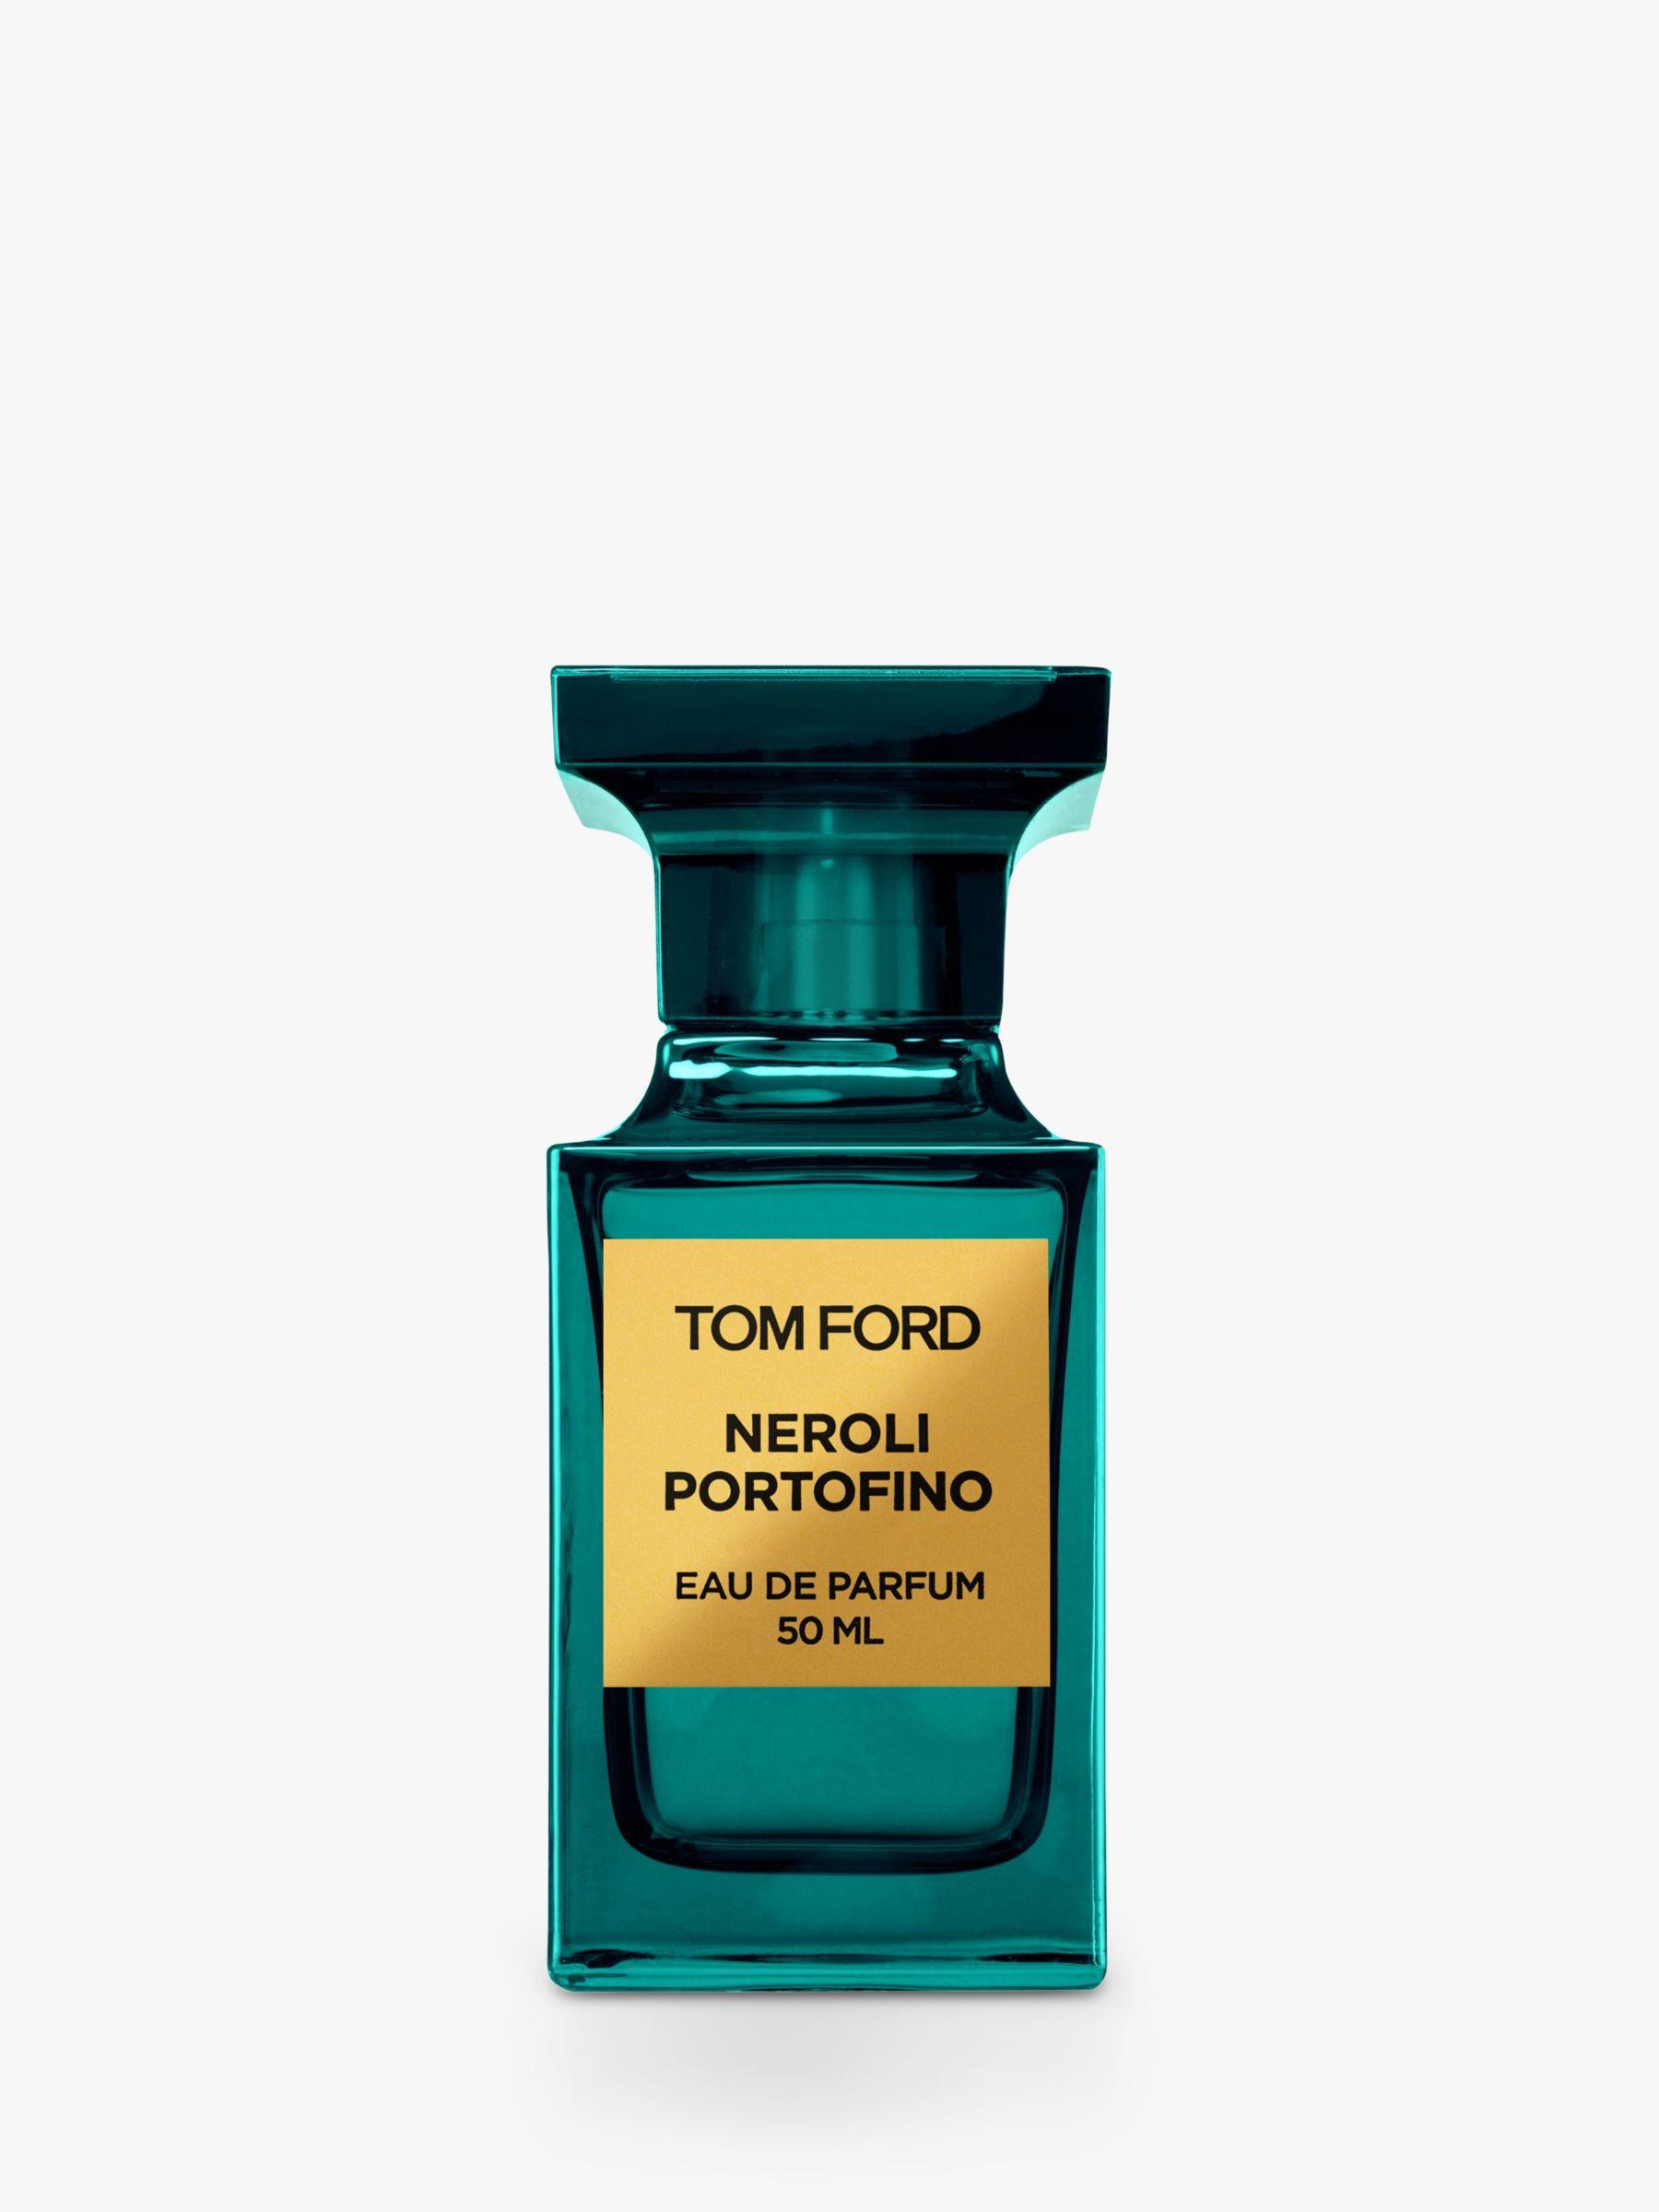 Tom Ford Private Blend Neroli Portofino Eau De Parfum 50ml At John